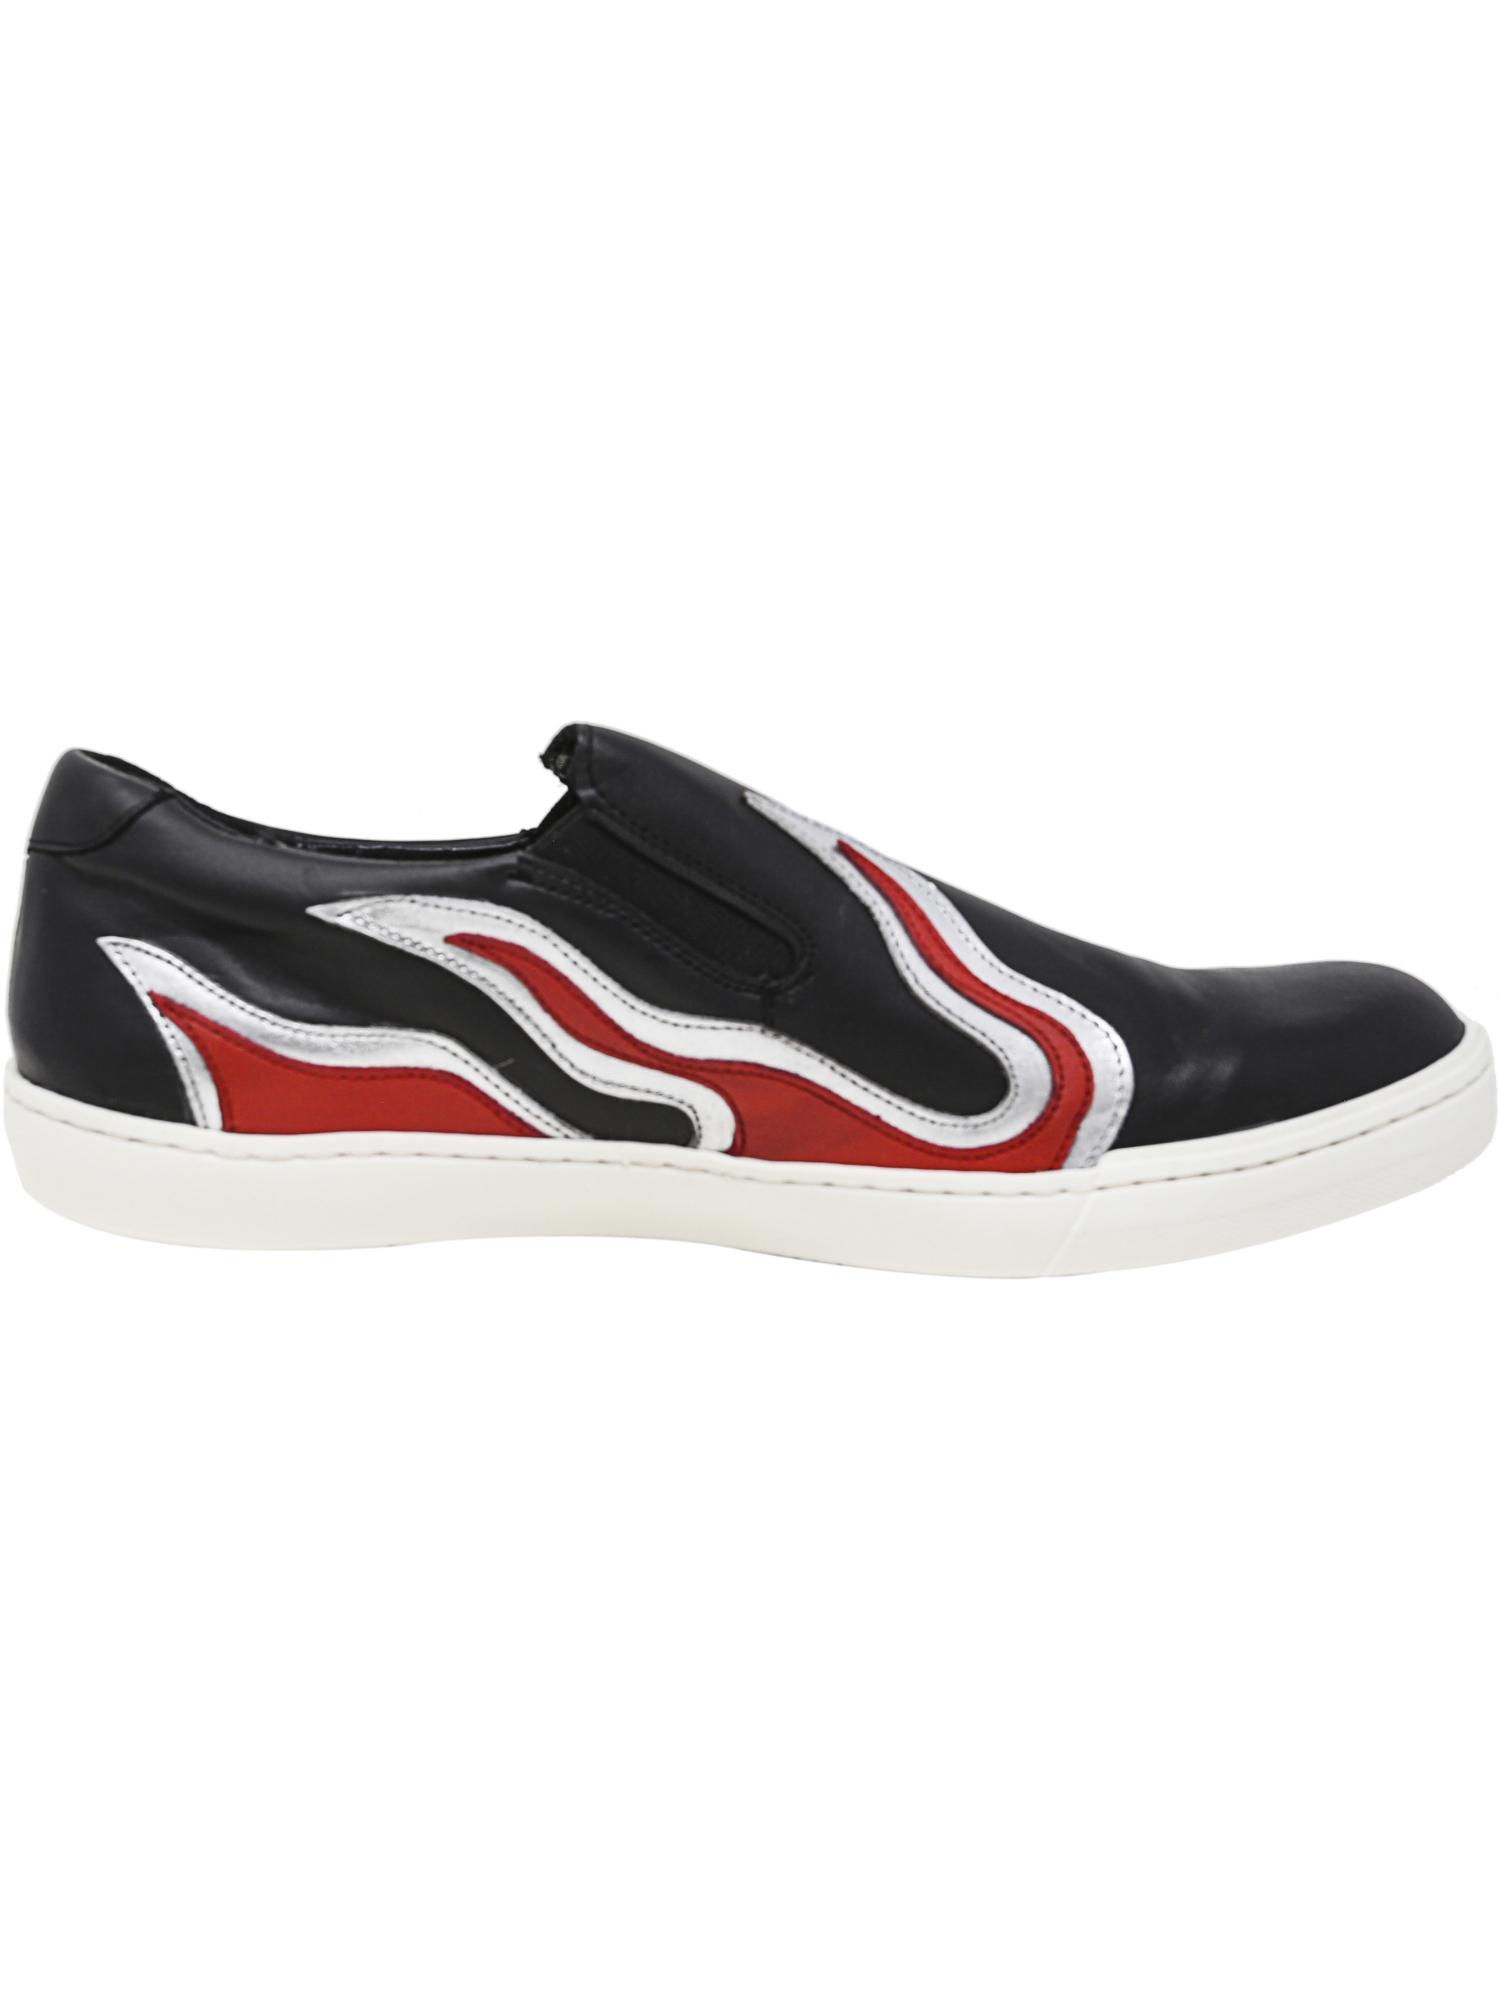 d4d9c33db6023 Steve Madden Men's Inferno Ankle-High Leather Slip-On Shoes | eBay